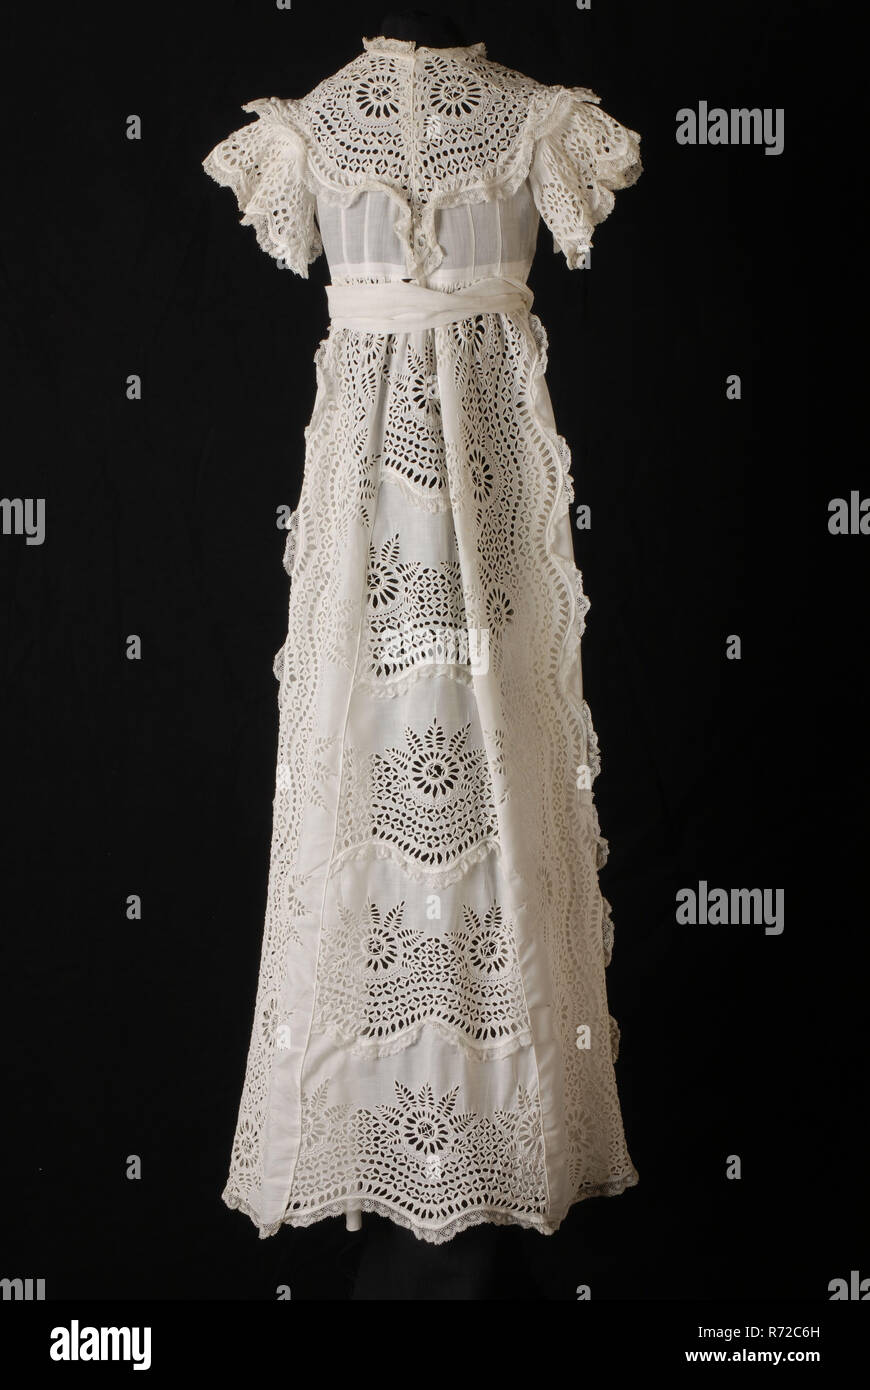 72dcad475863 Lunga vasta baby dress in cotone bianco